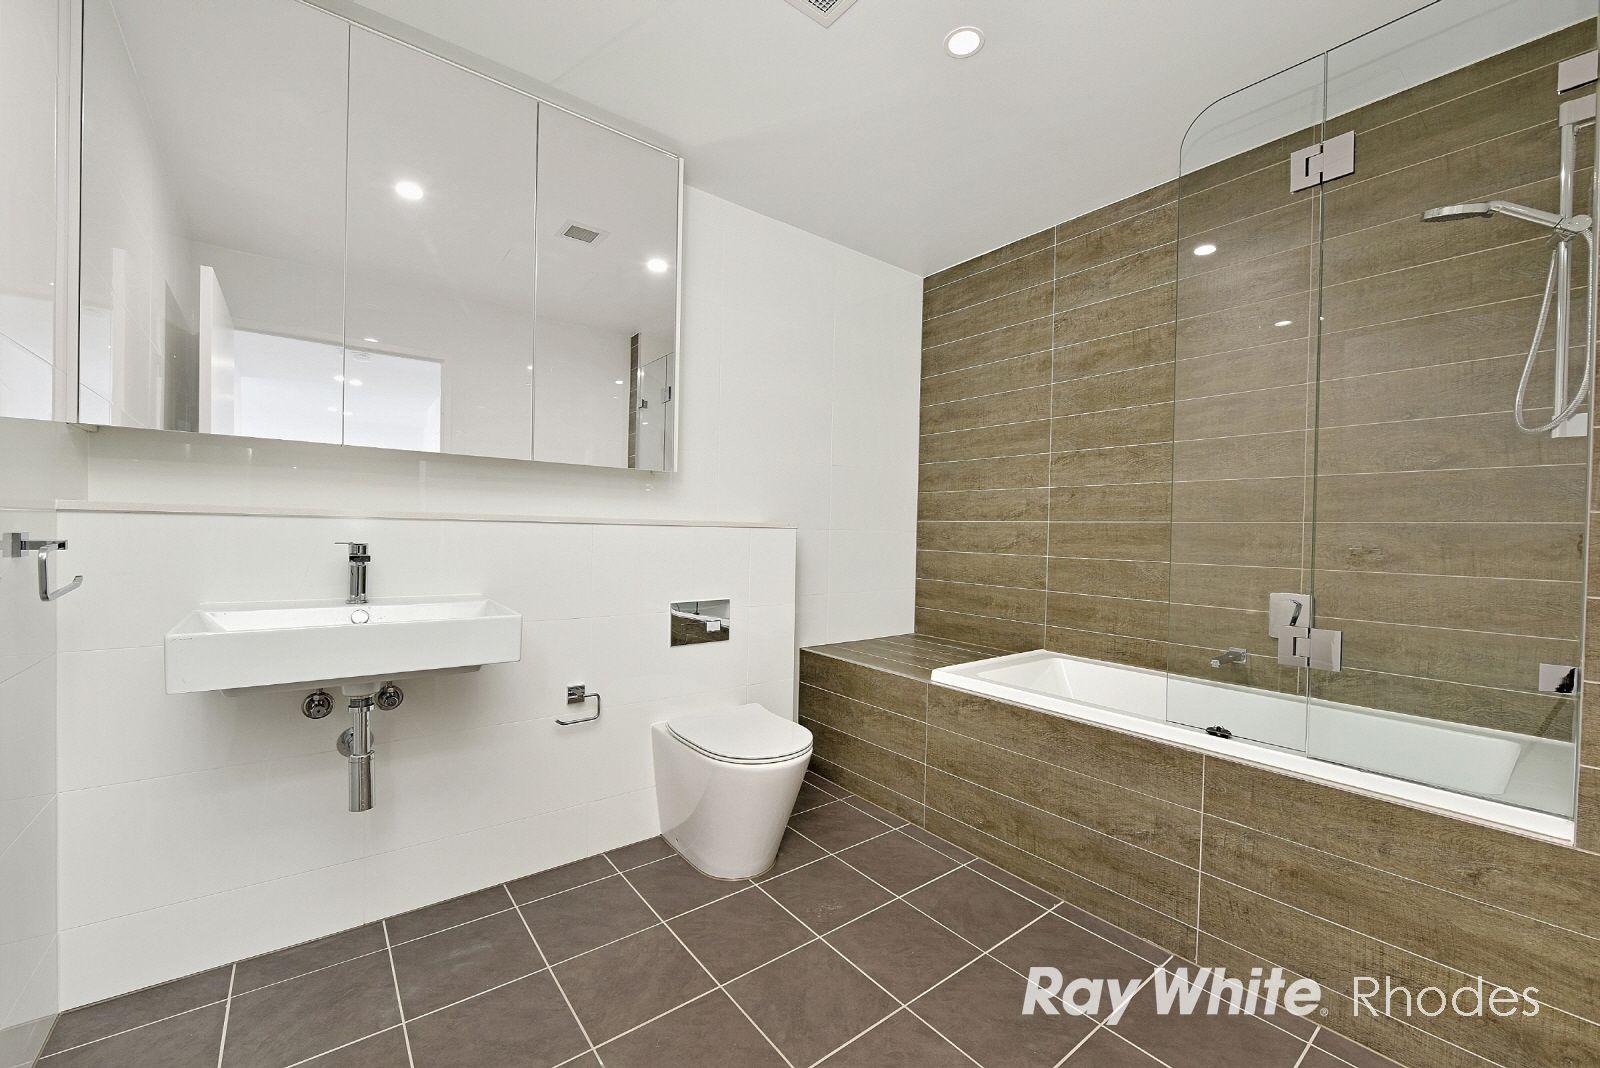 19/7 Porter St, Ryde NSW 2112, Image 2